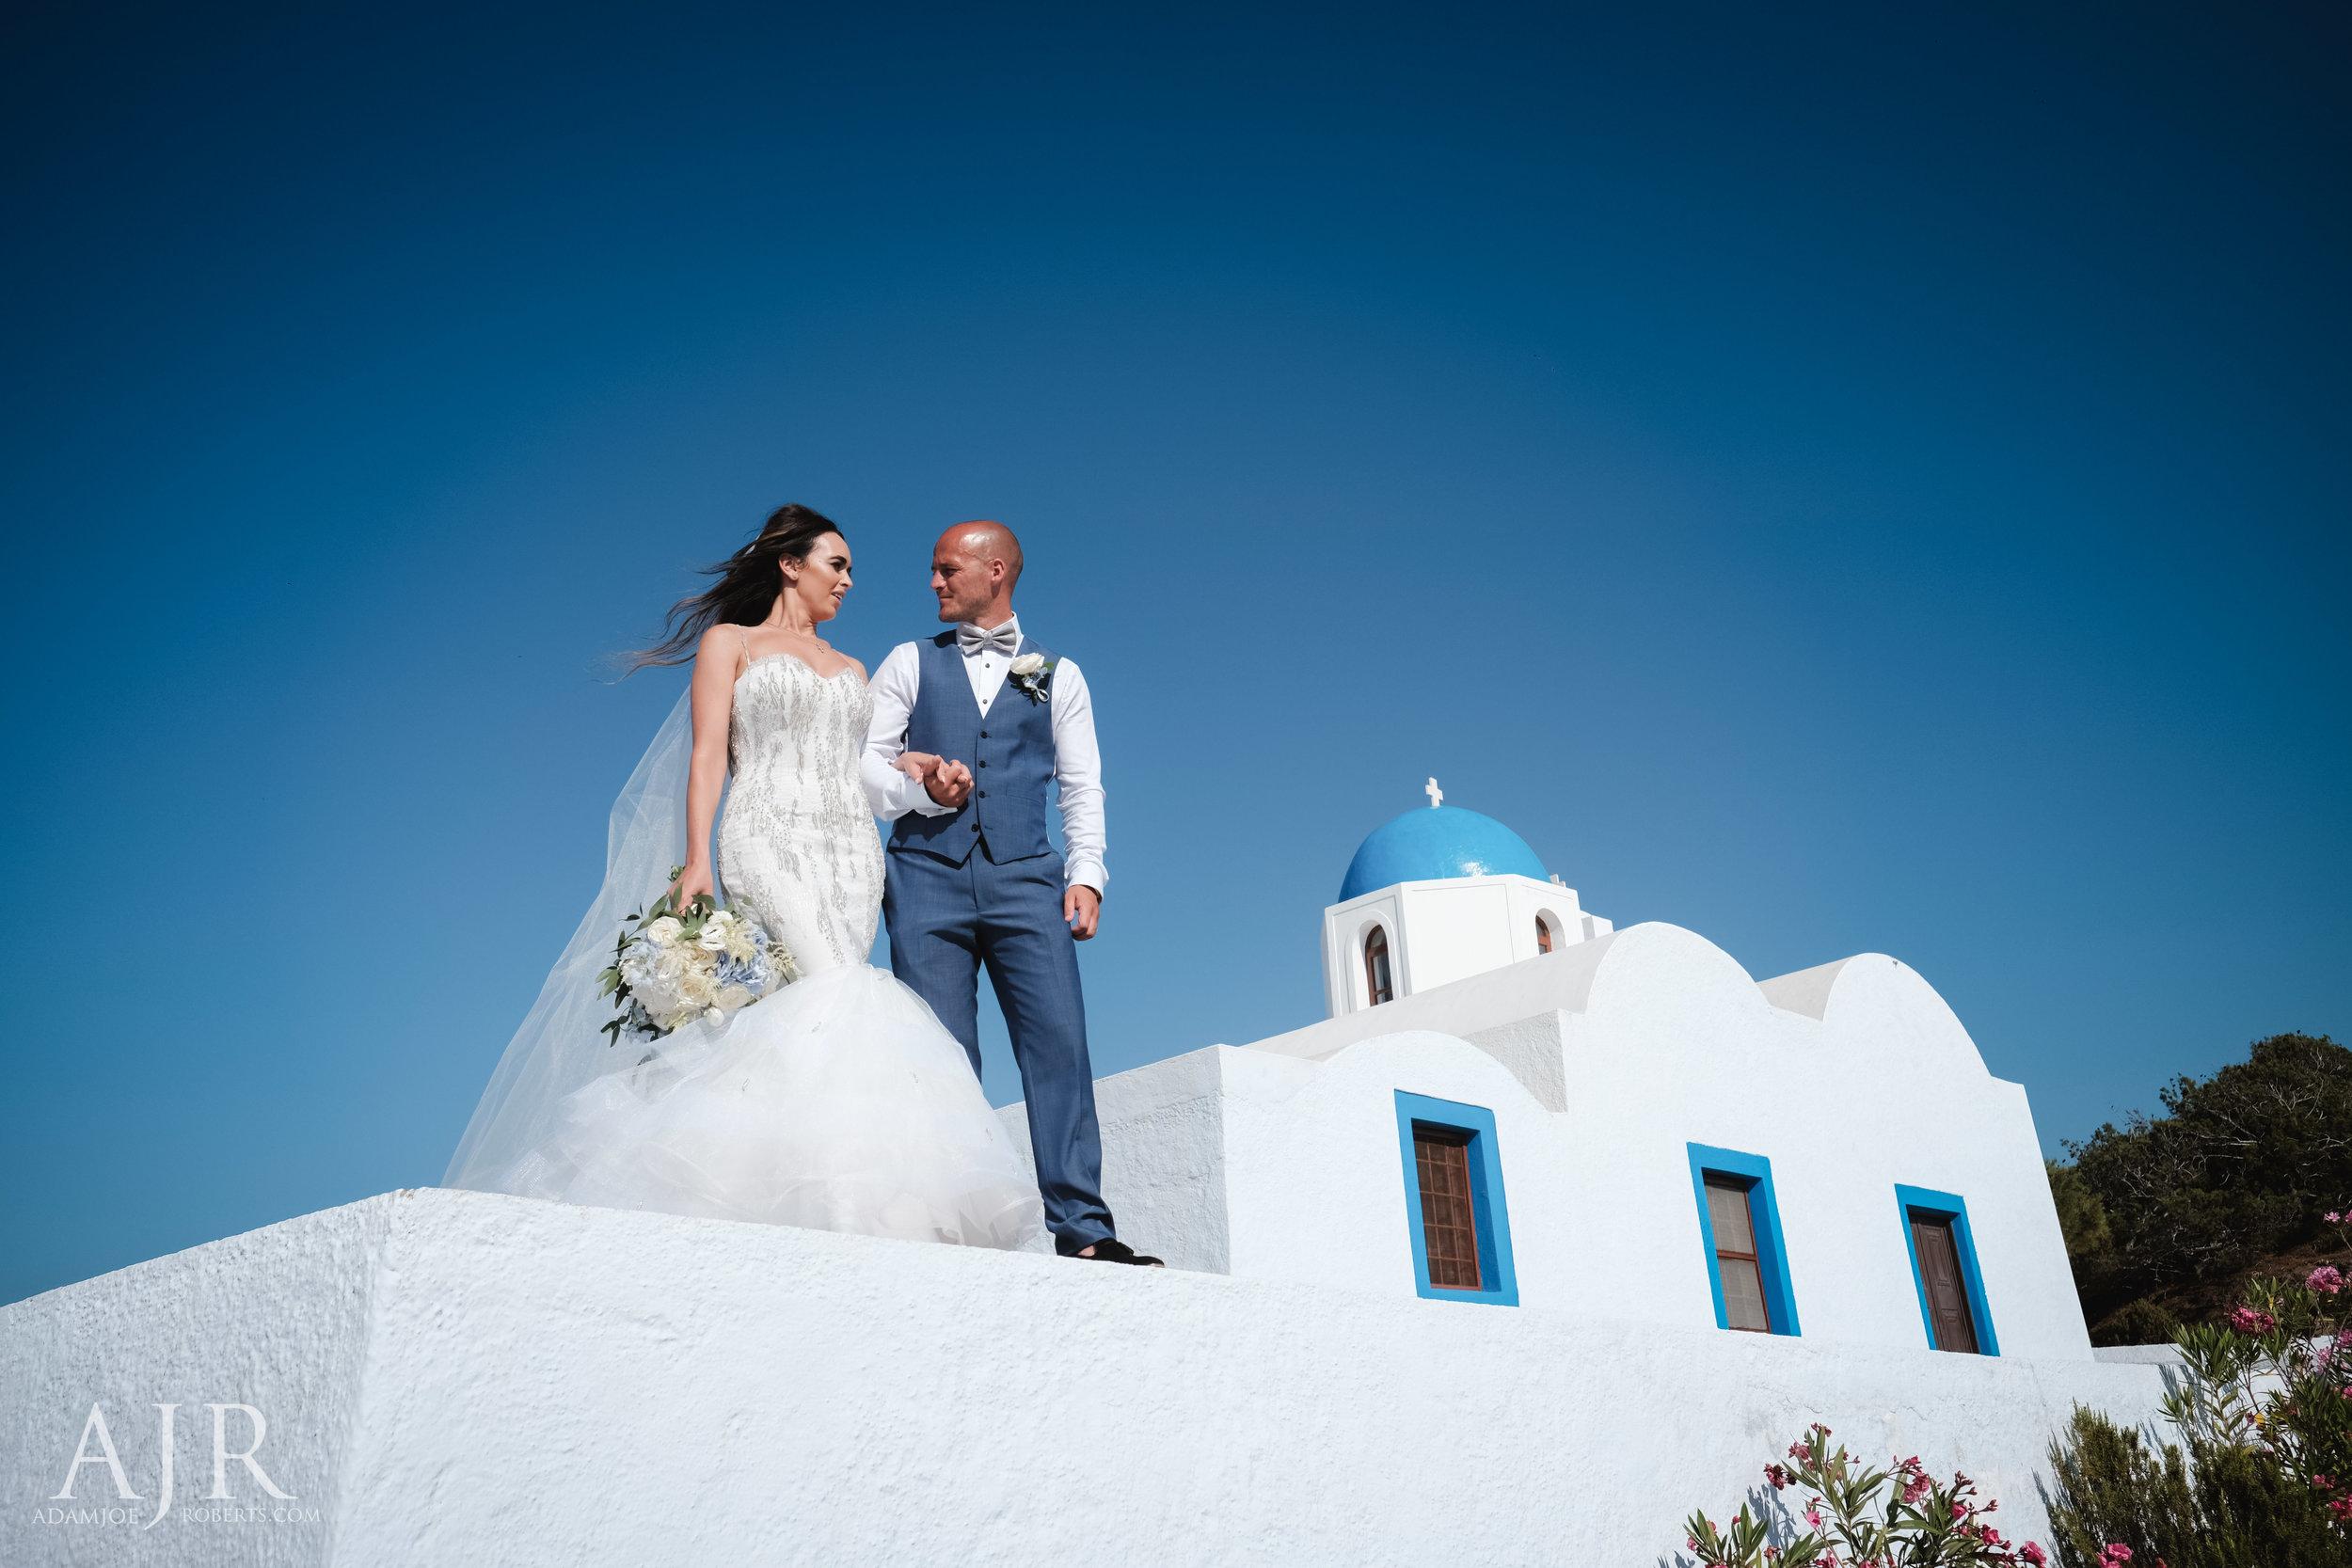 Mollie and Antony Le Ciel Santorini Destination Wedding - Sneak Peek (6 of 15).jpg